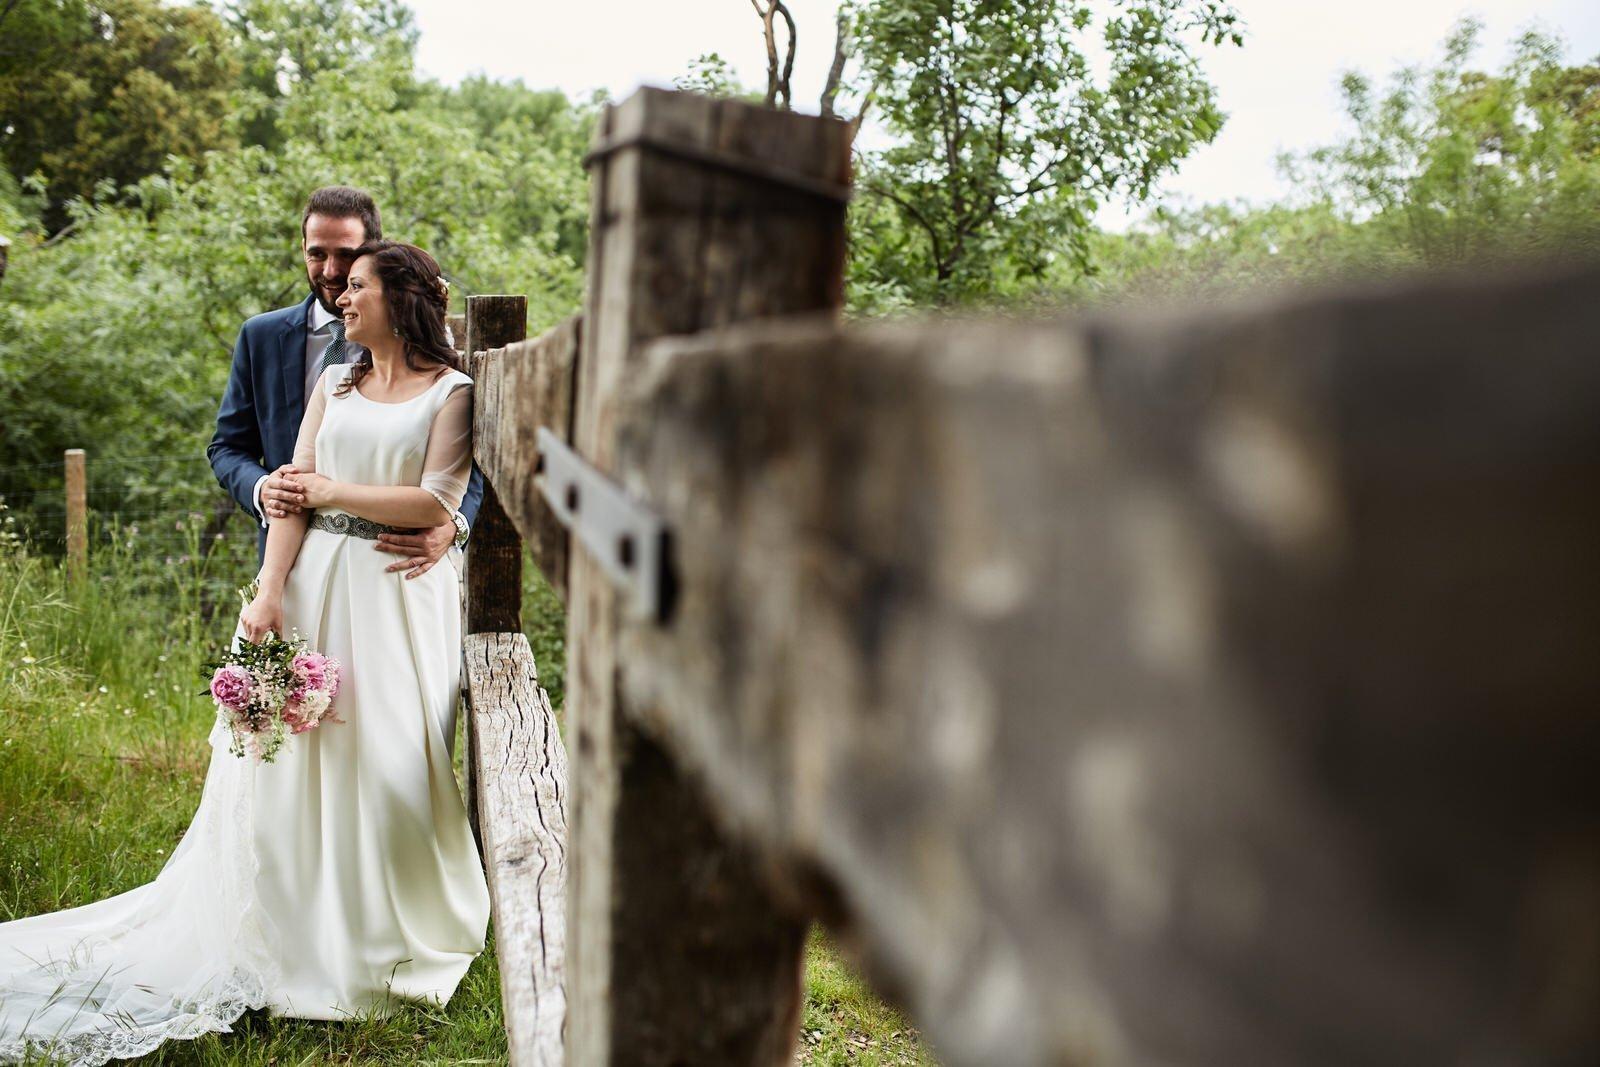 boda-carlos-laura-san-lorenzo-escorial-pgg (24)